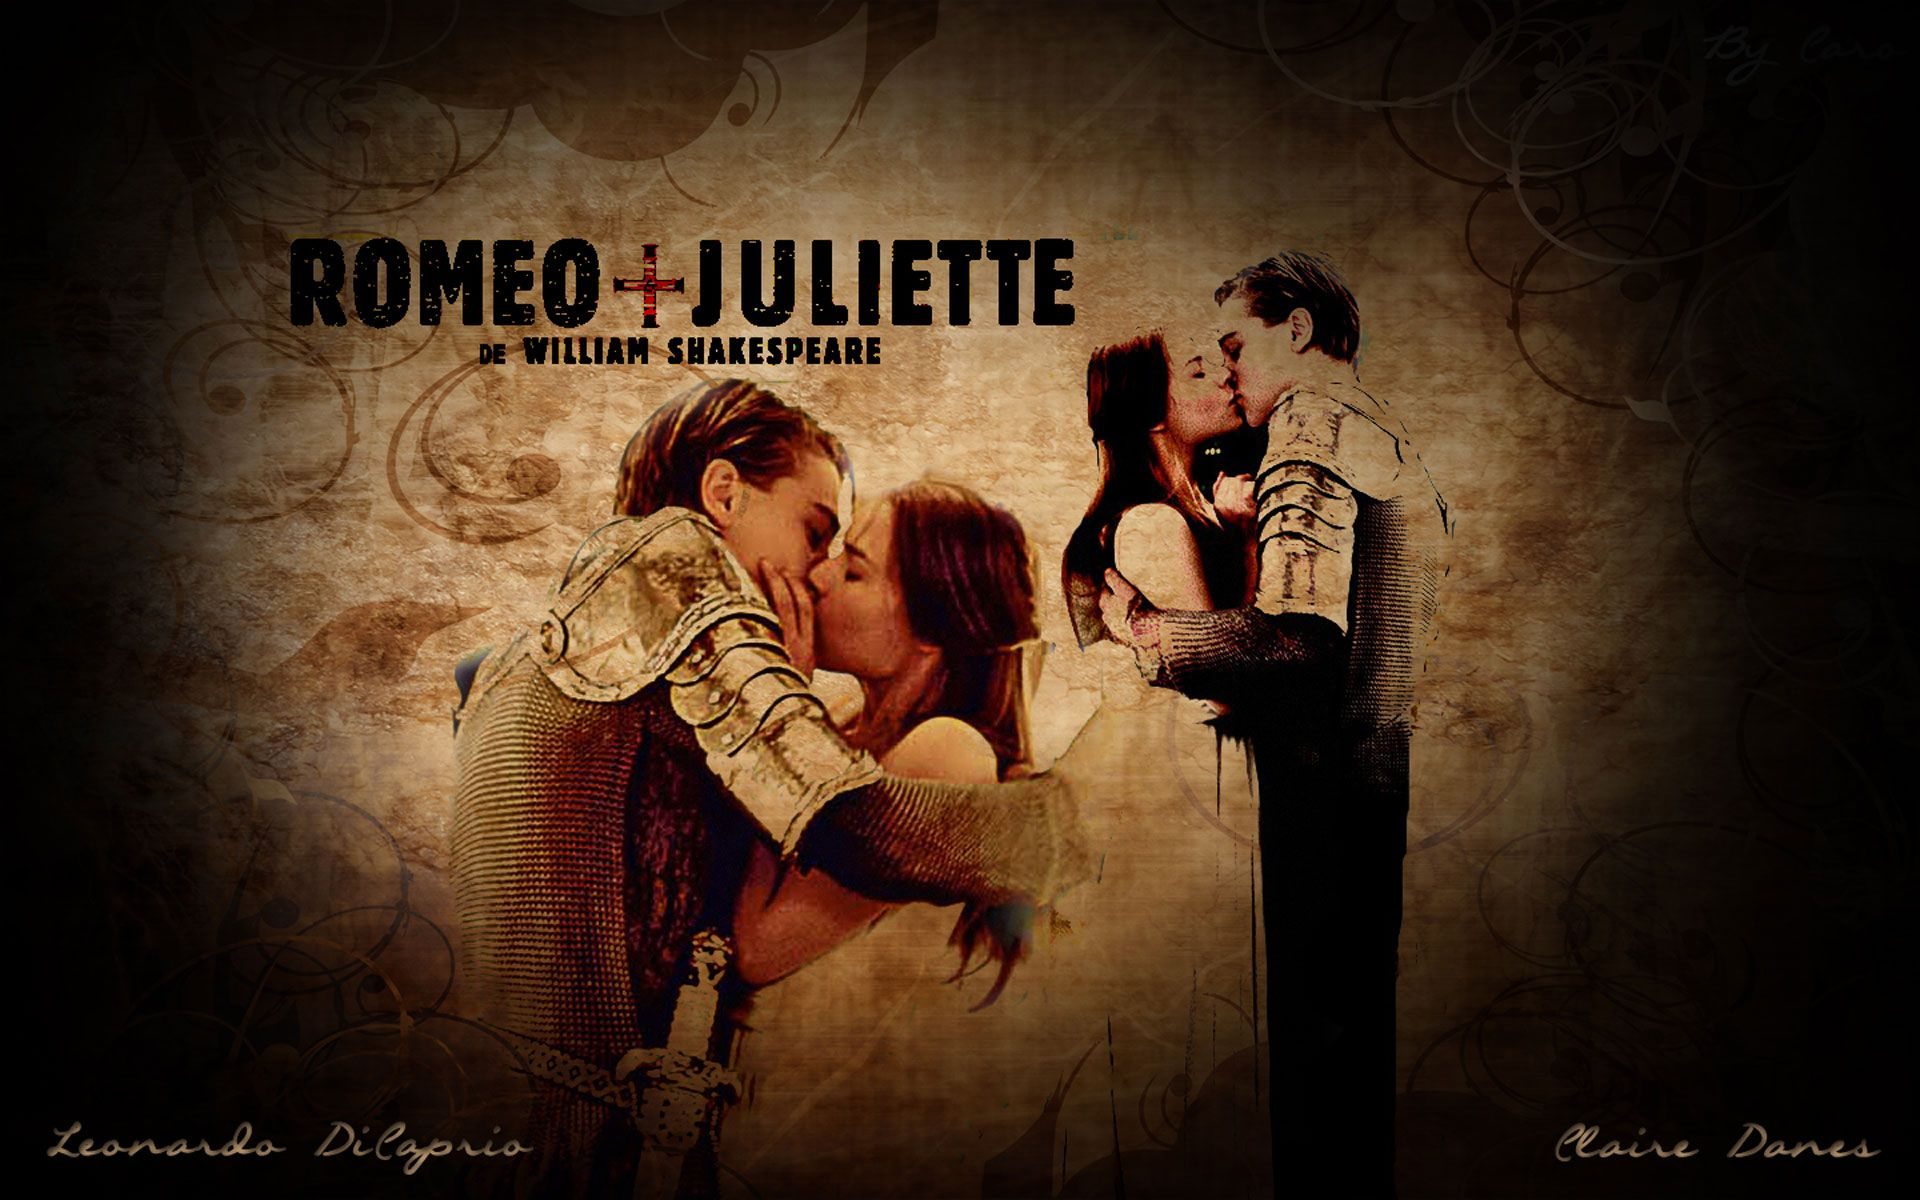 Romeo + Juliet (1996, wallpaper) Juliette, Roméo et